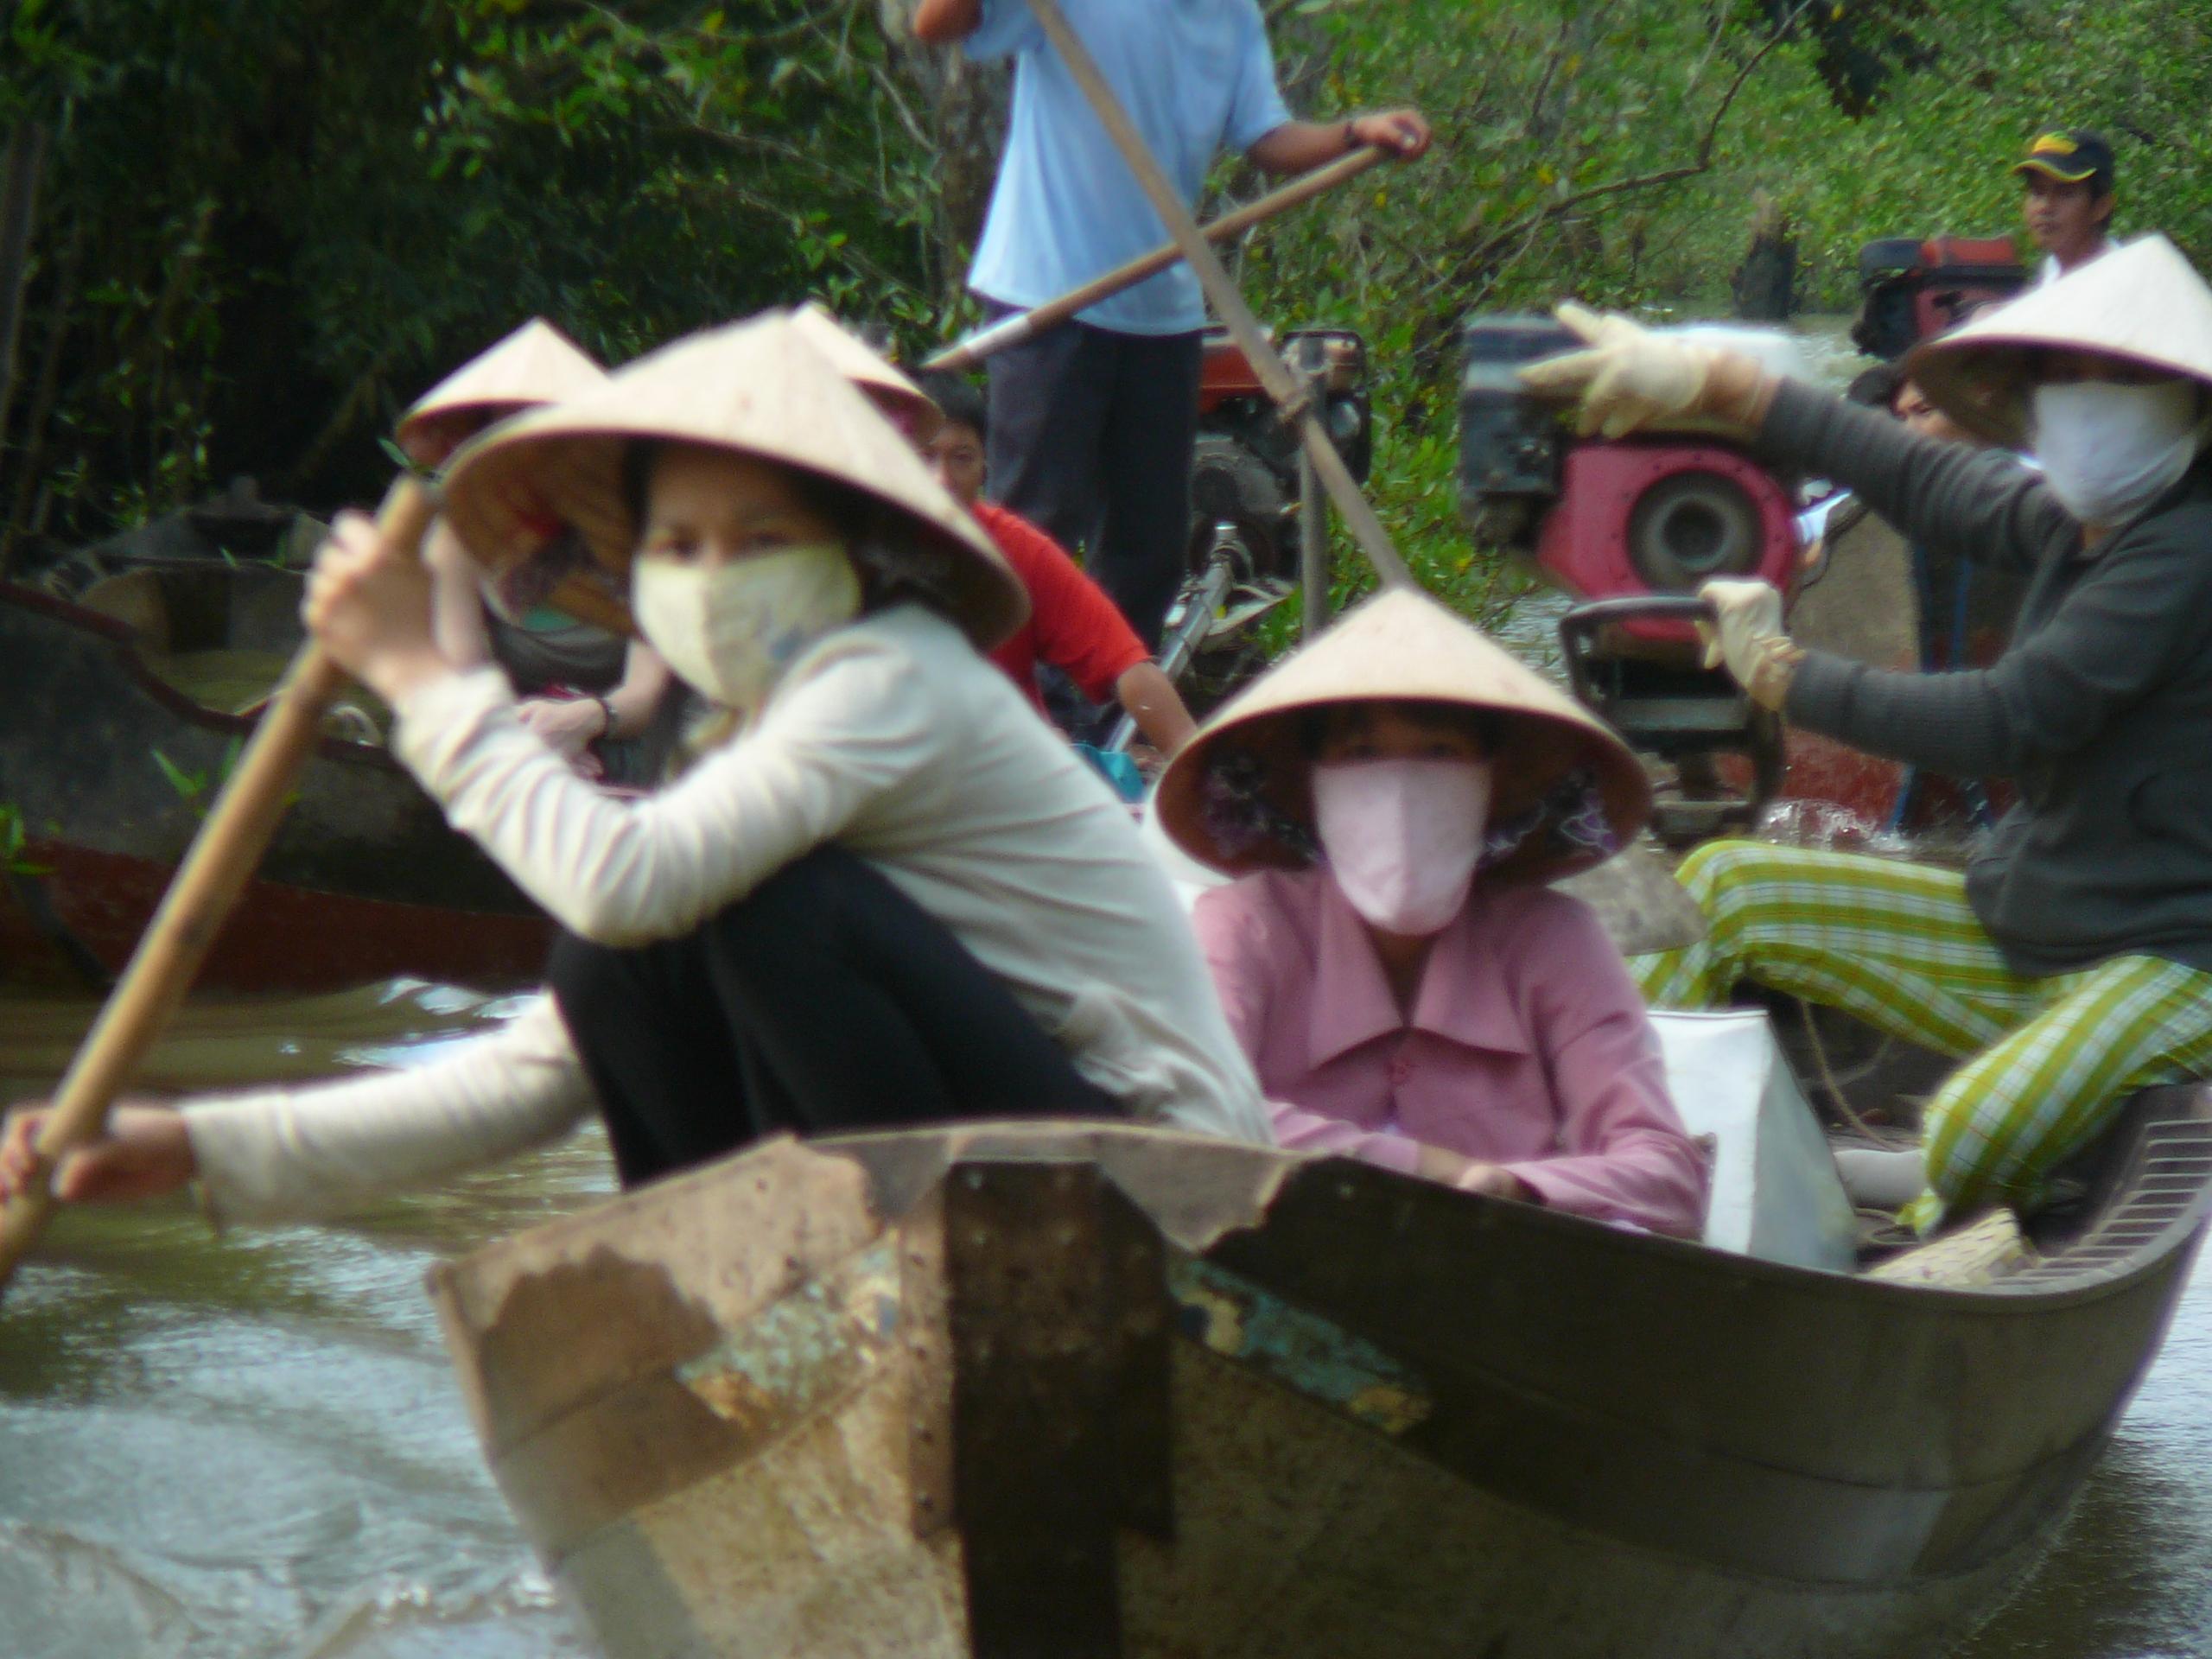 HAFEN FORUM Reisebericht - Bilderreise - Vietnam - Kambodscha - Laos